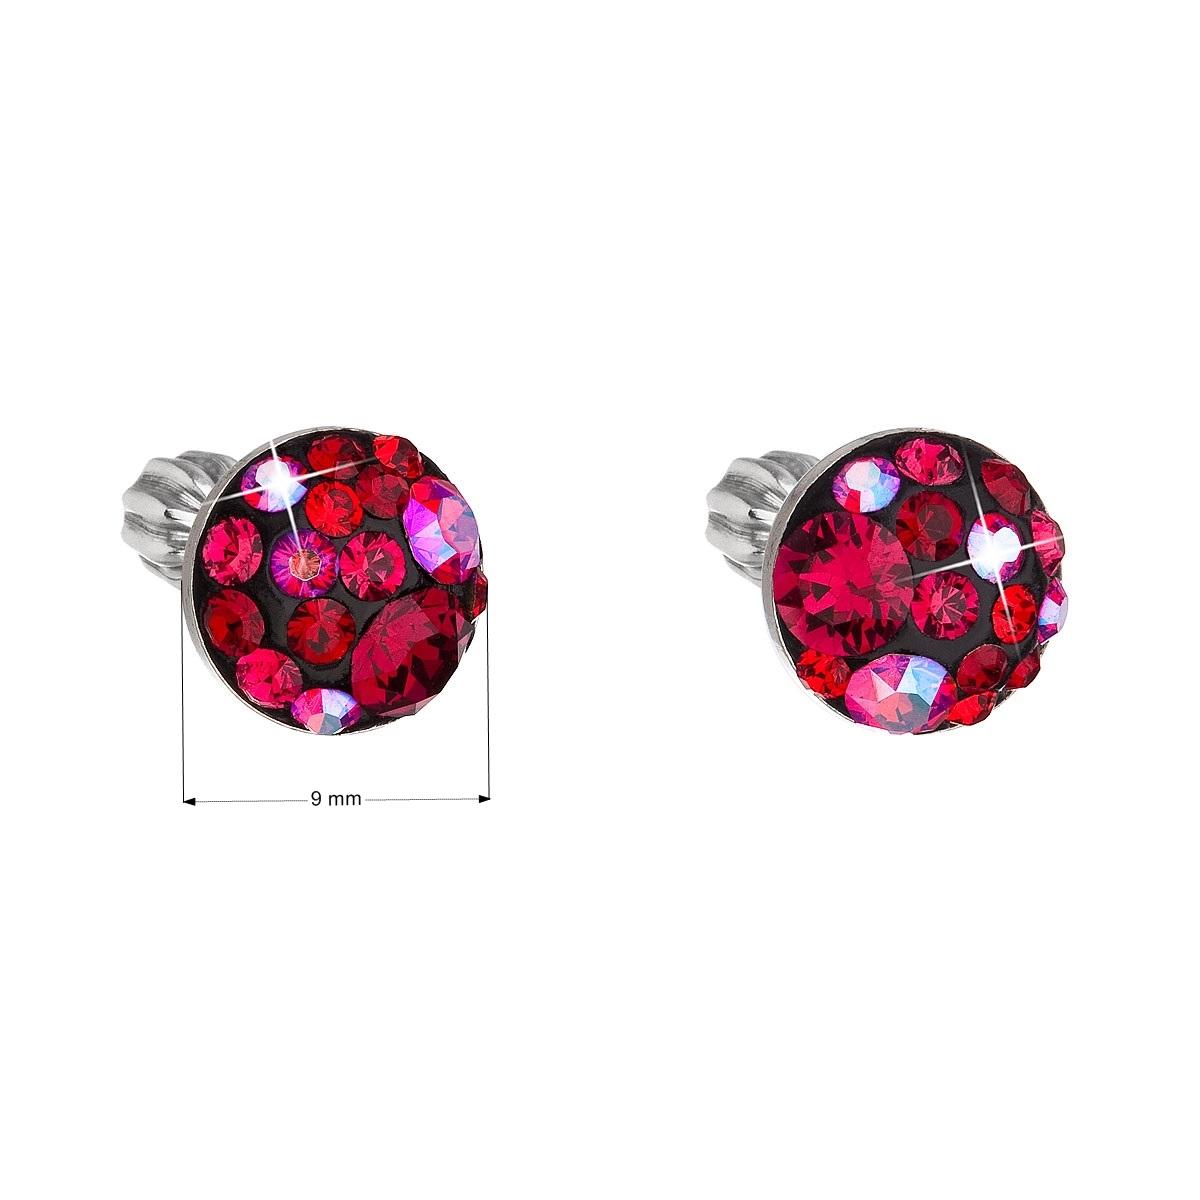 Stříbrné náušnice s krystaly Crystals from Swarovski®, Cherry EG2008-CH